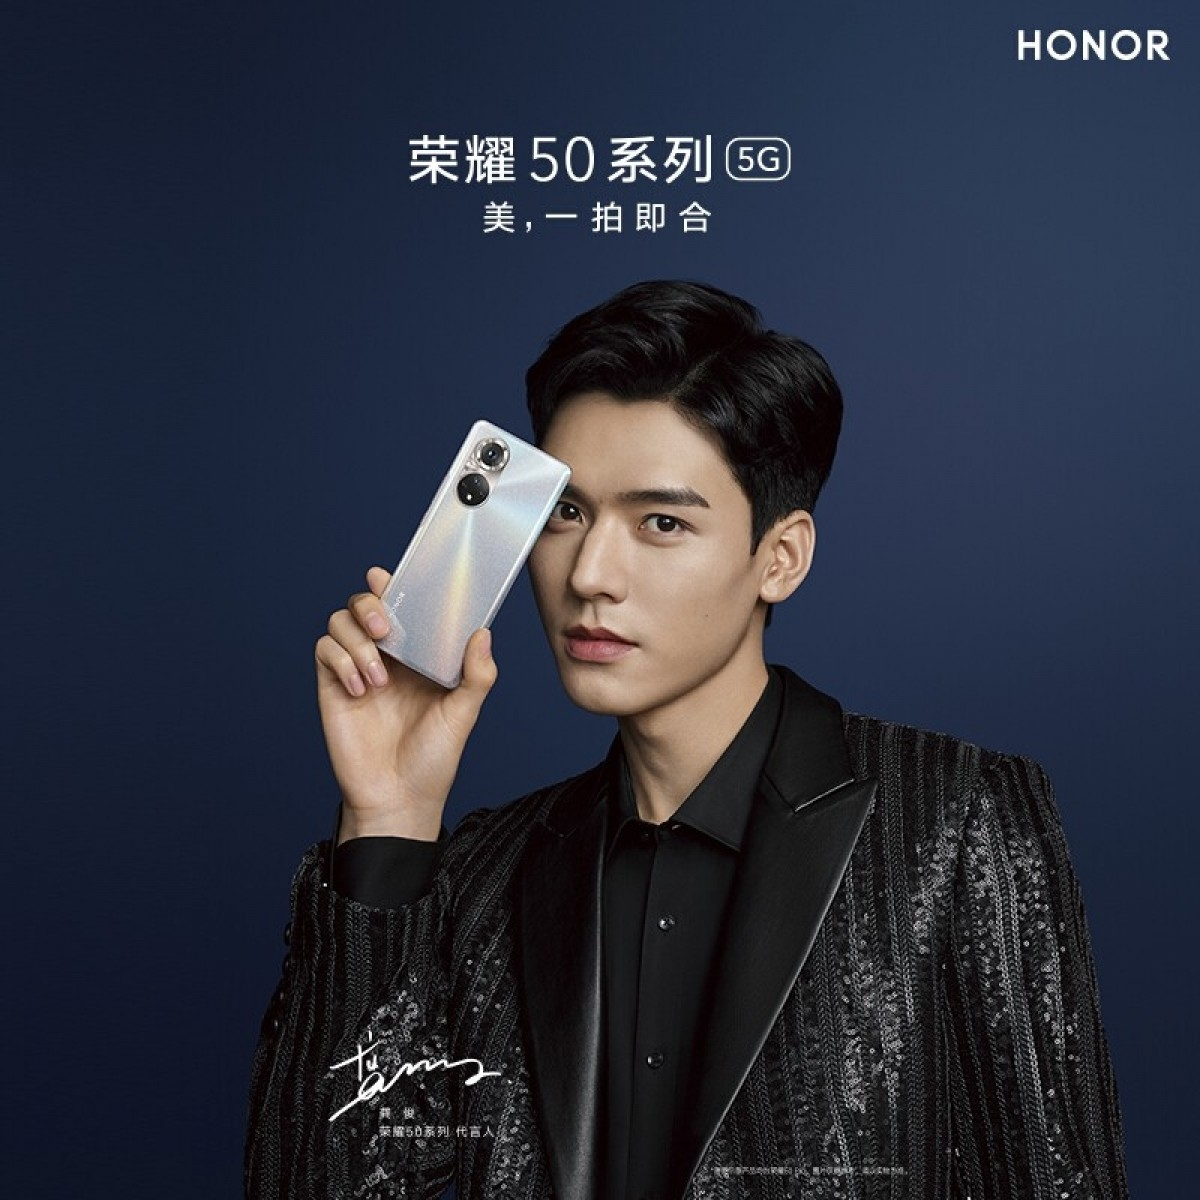 Honor 50's Camera Revealed in New Teaser